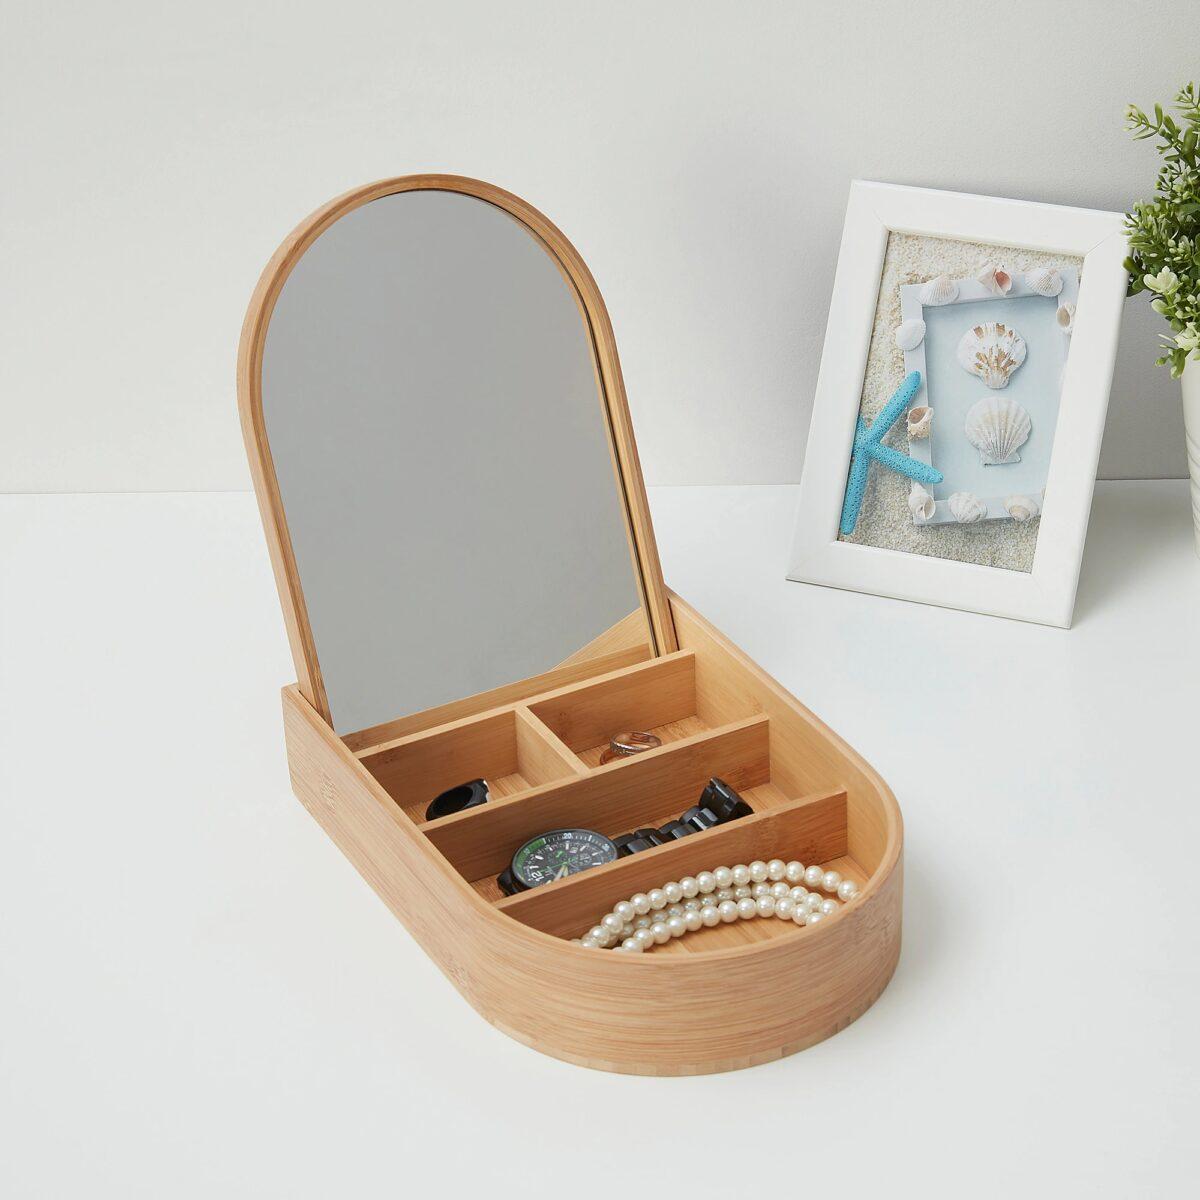 dragan-portagioie-bambu-